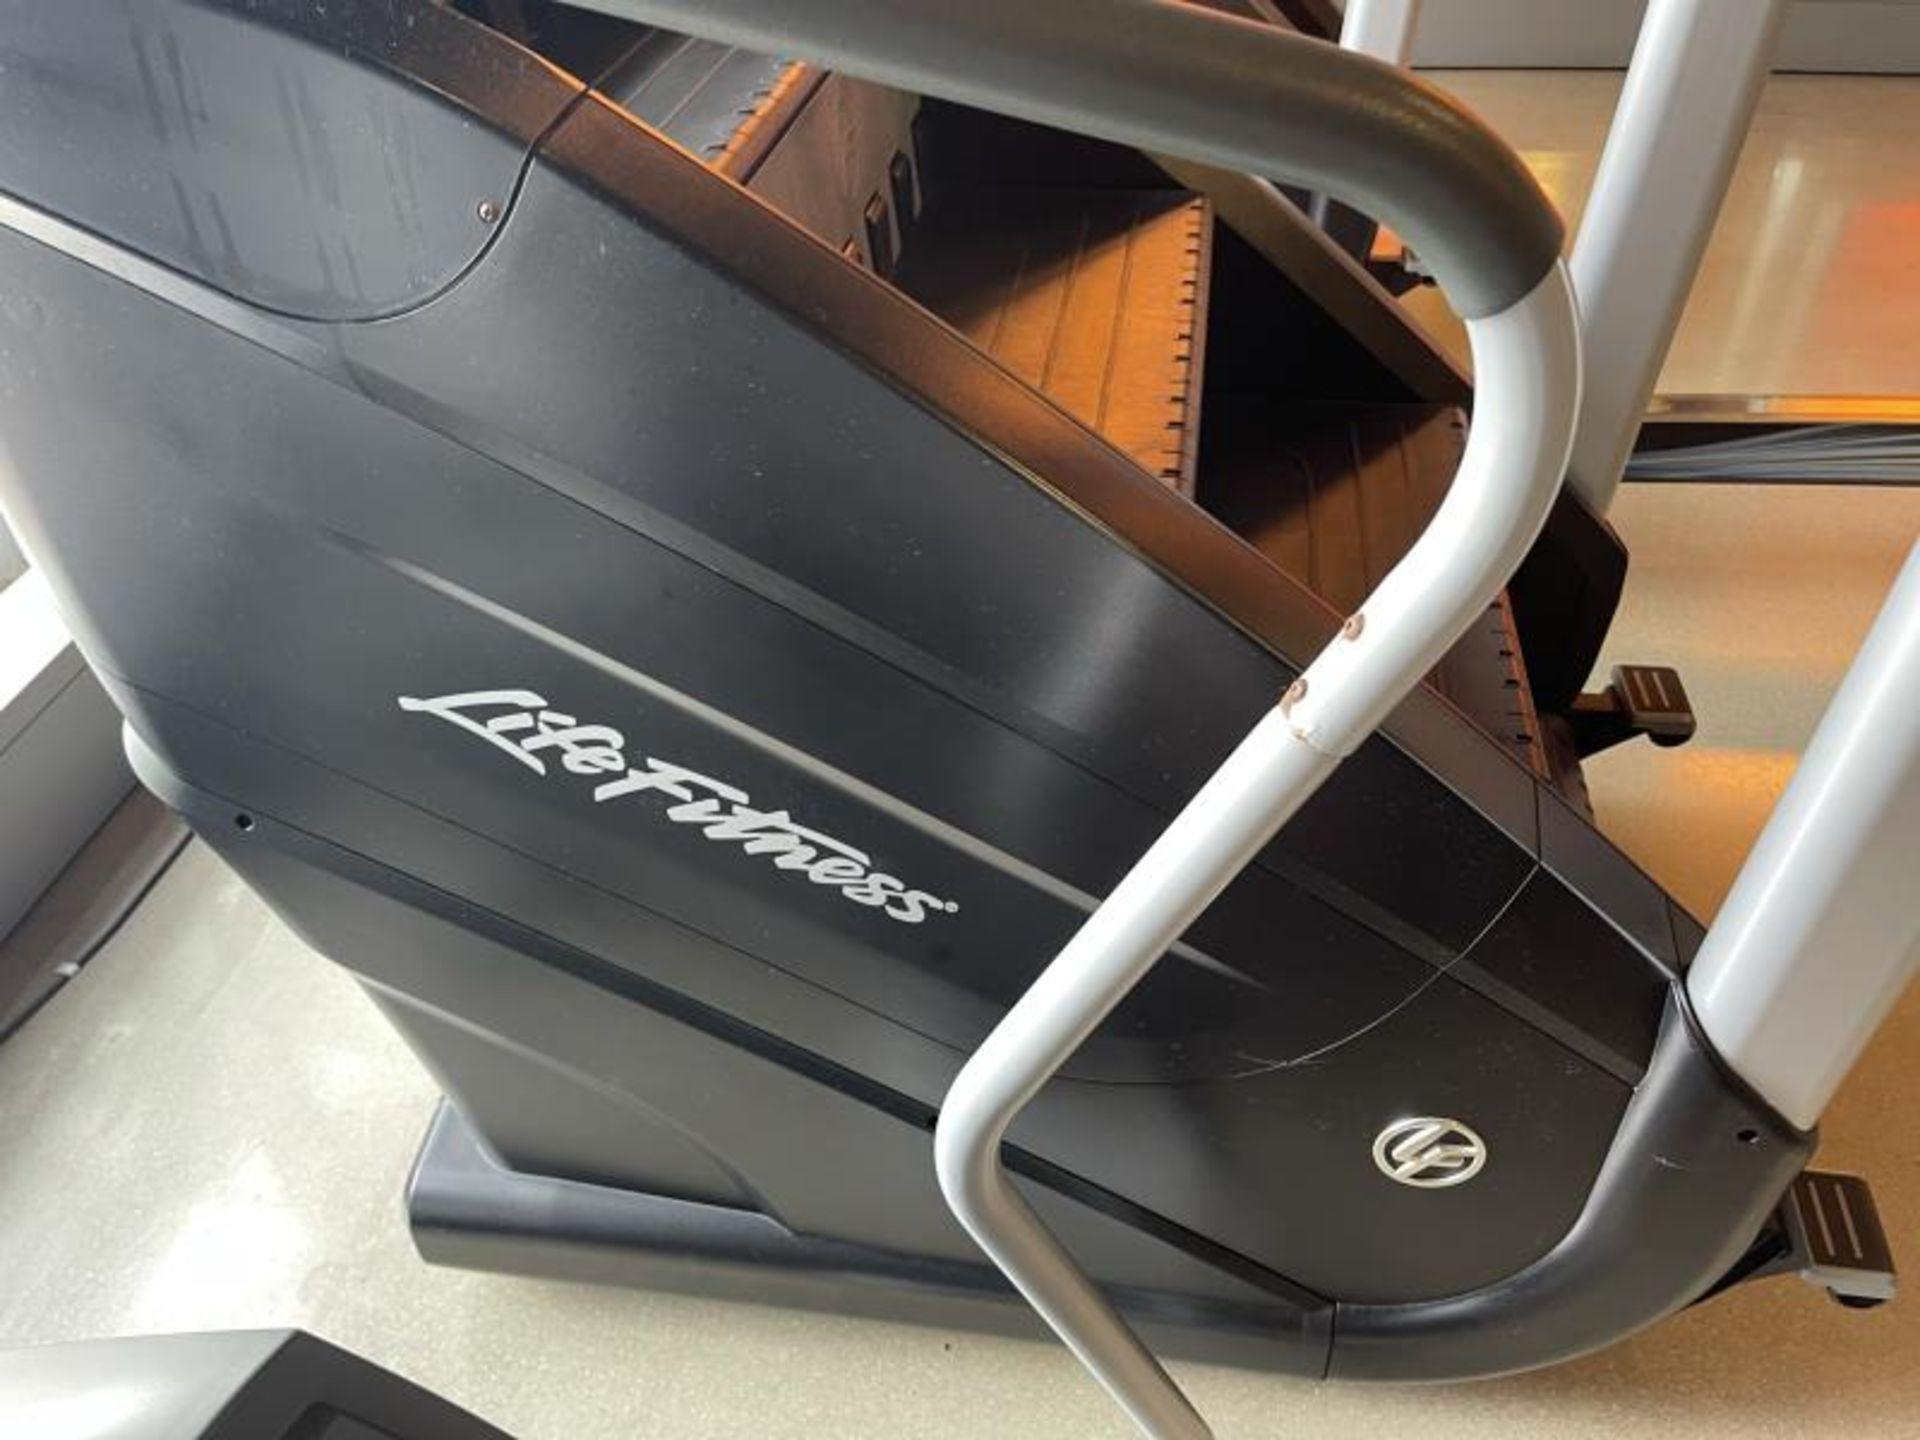 Life Fitness Powermill SN: PMH103963 - Image 3 of 7